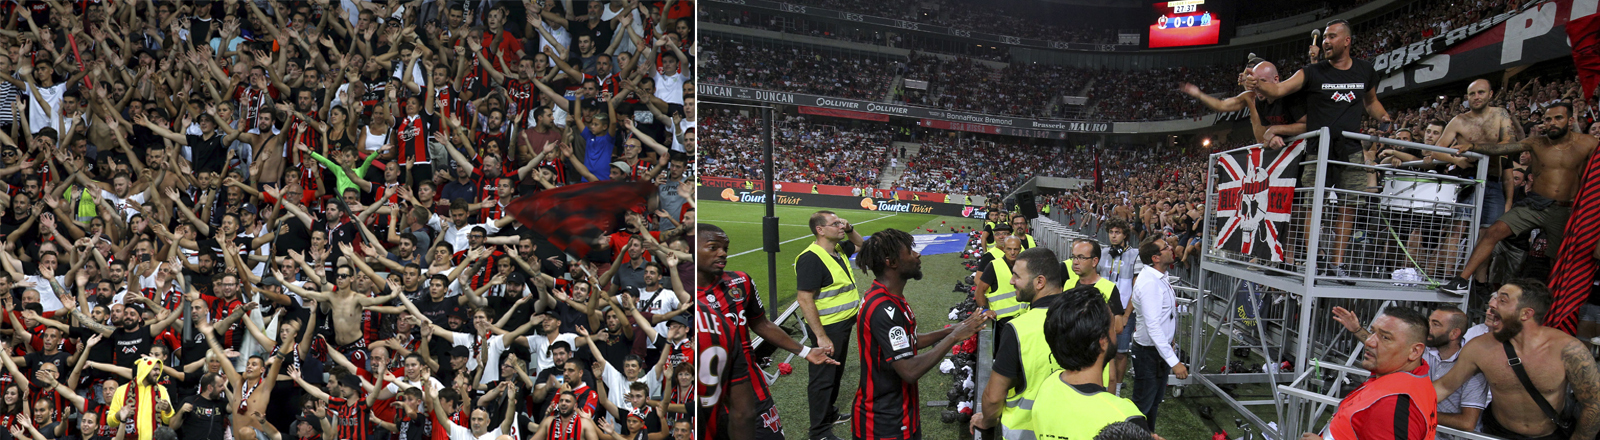 Spiel OGC Nice gegen Olympique Marseille: Unterbrechung wegen homophober Gesänge